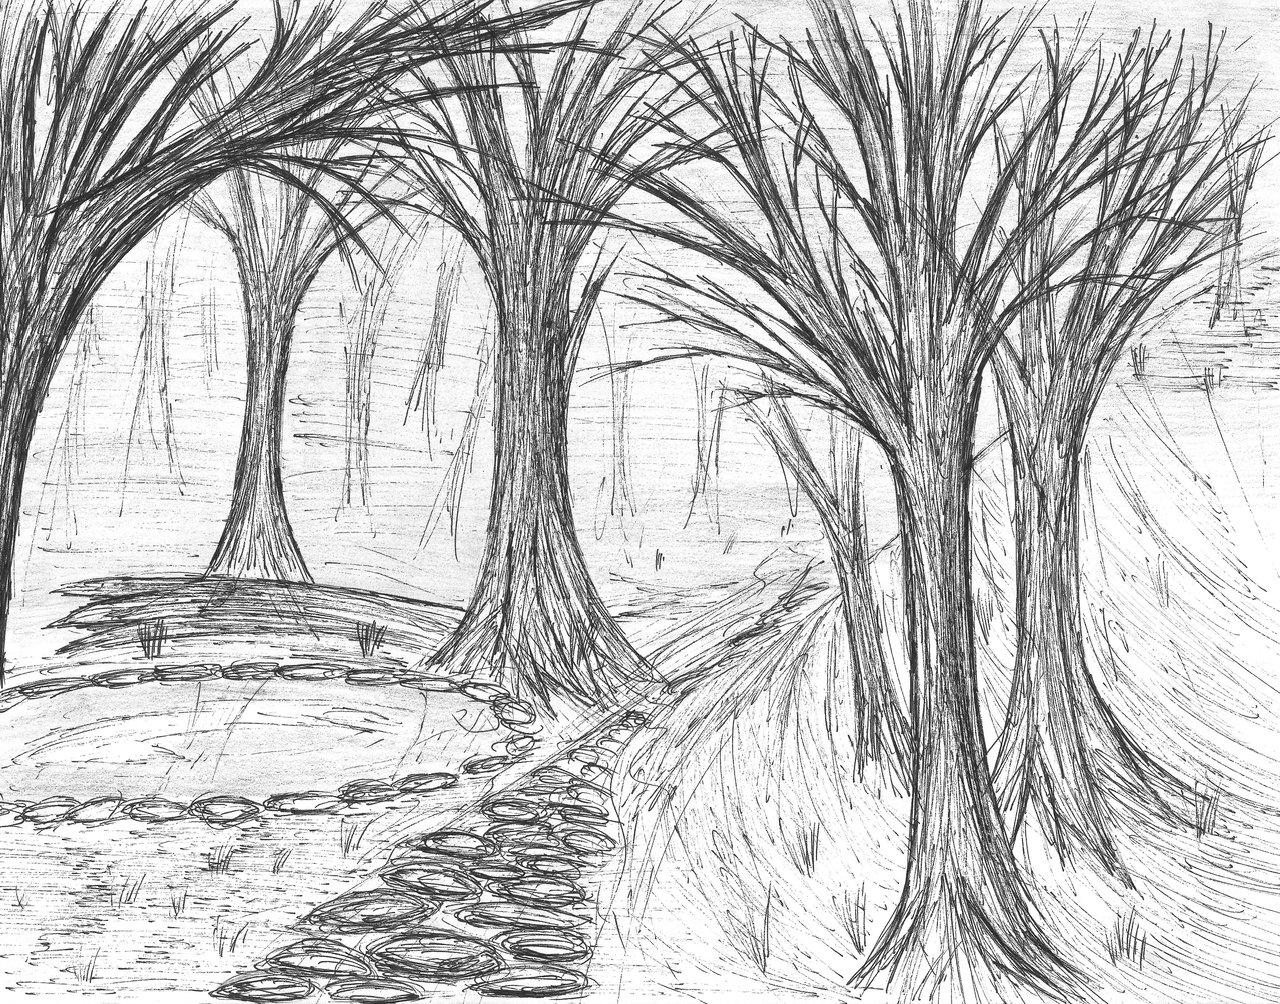 Drawn scenic black pen Tree/Scenery Pen by Trigun402 Pen